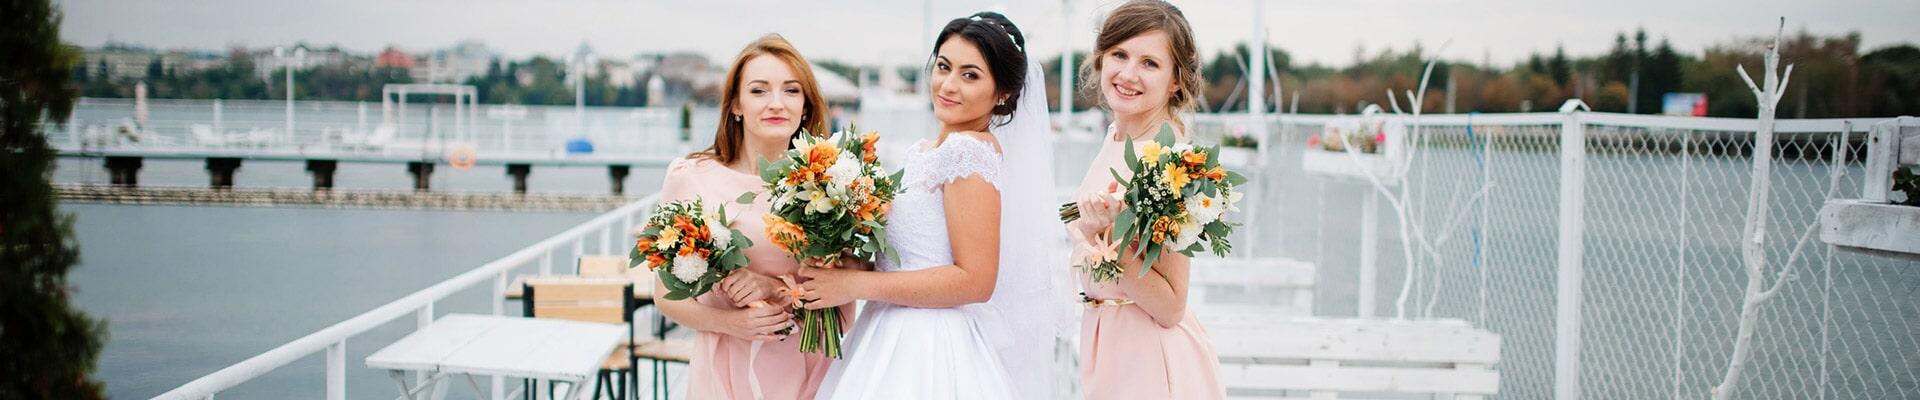 Wedding Dresses Laundry